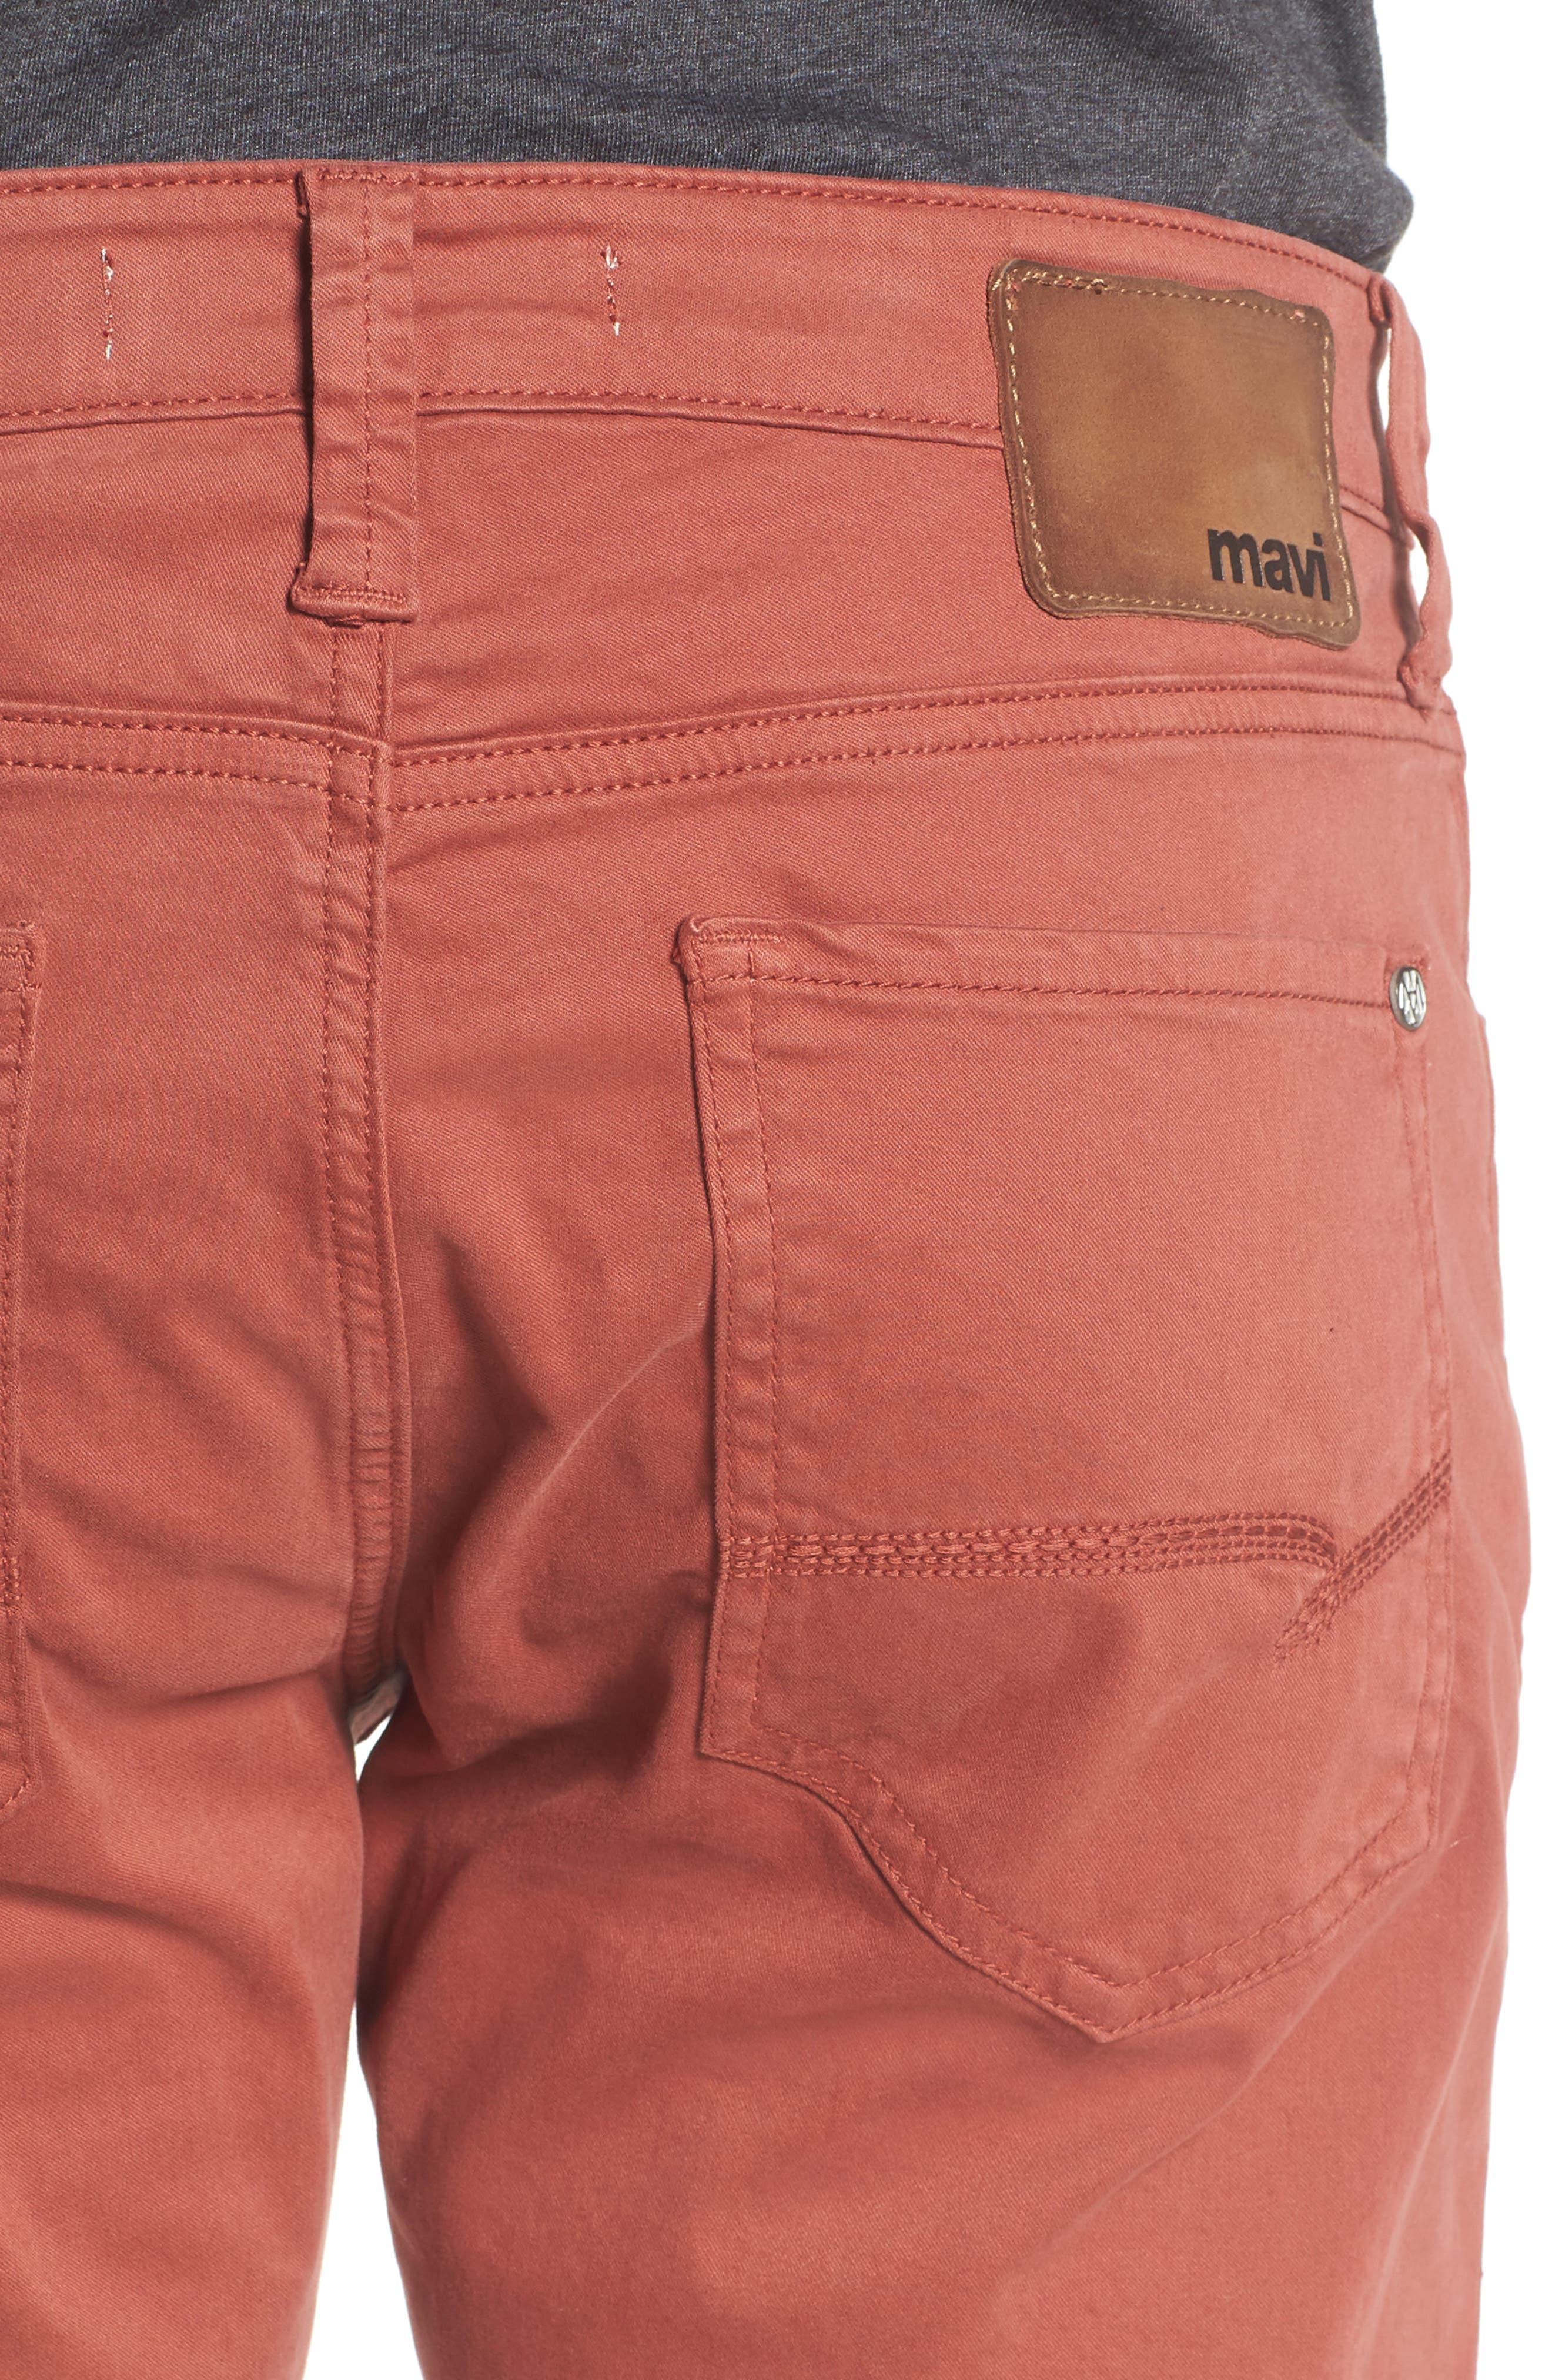 Zach Straight Leg Jeans,                             Alternate thumbnail 4, color,                             600